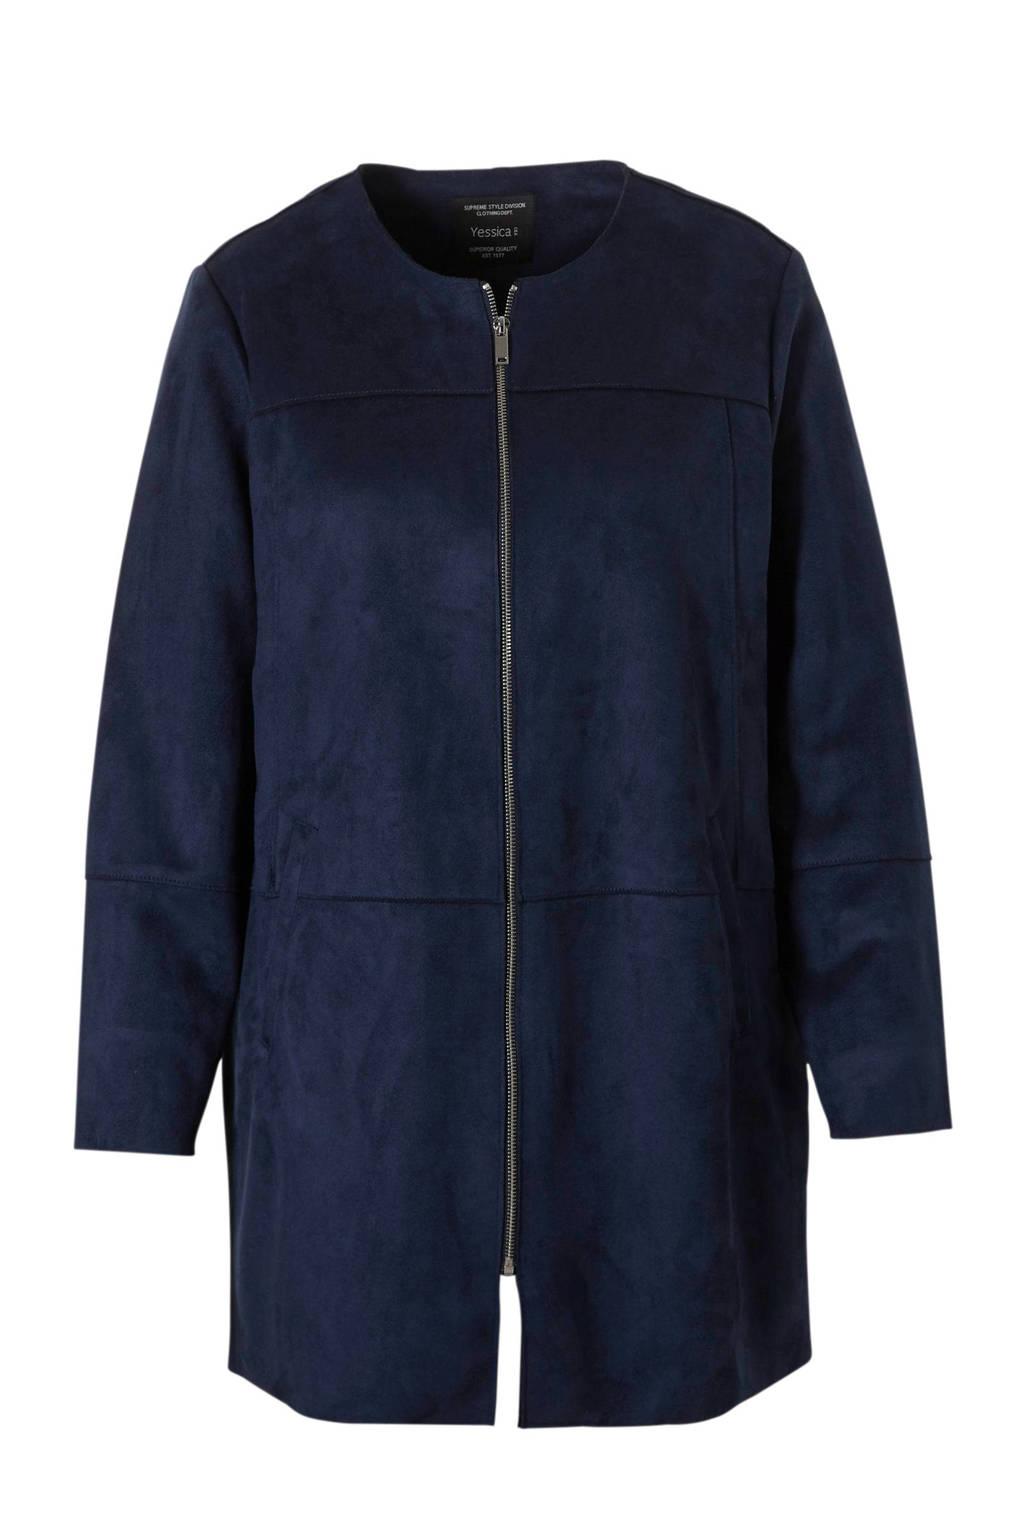 C&A XL Yessica imitatie suède jas donkerblauw, Donkerblauw